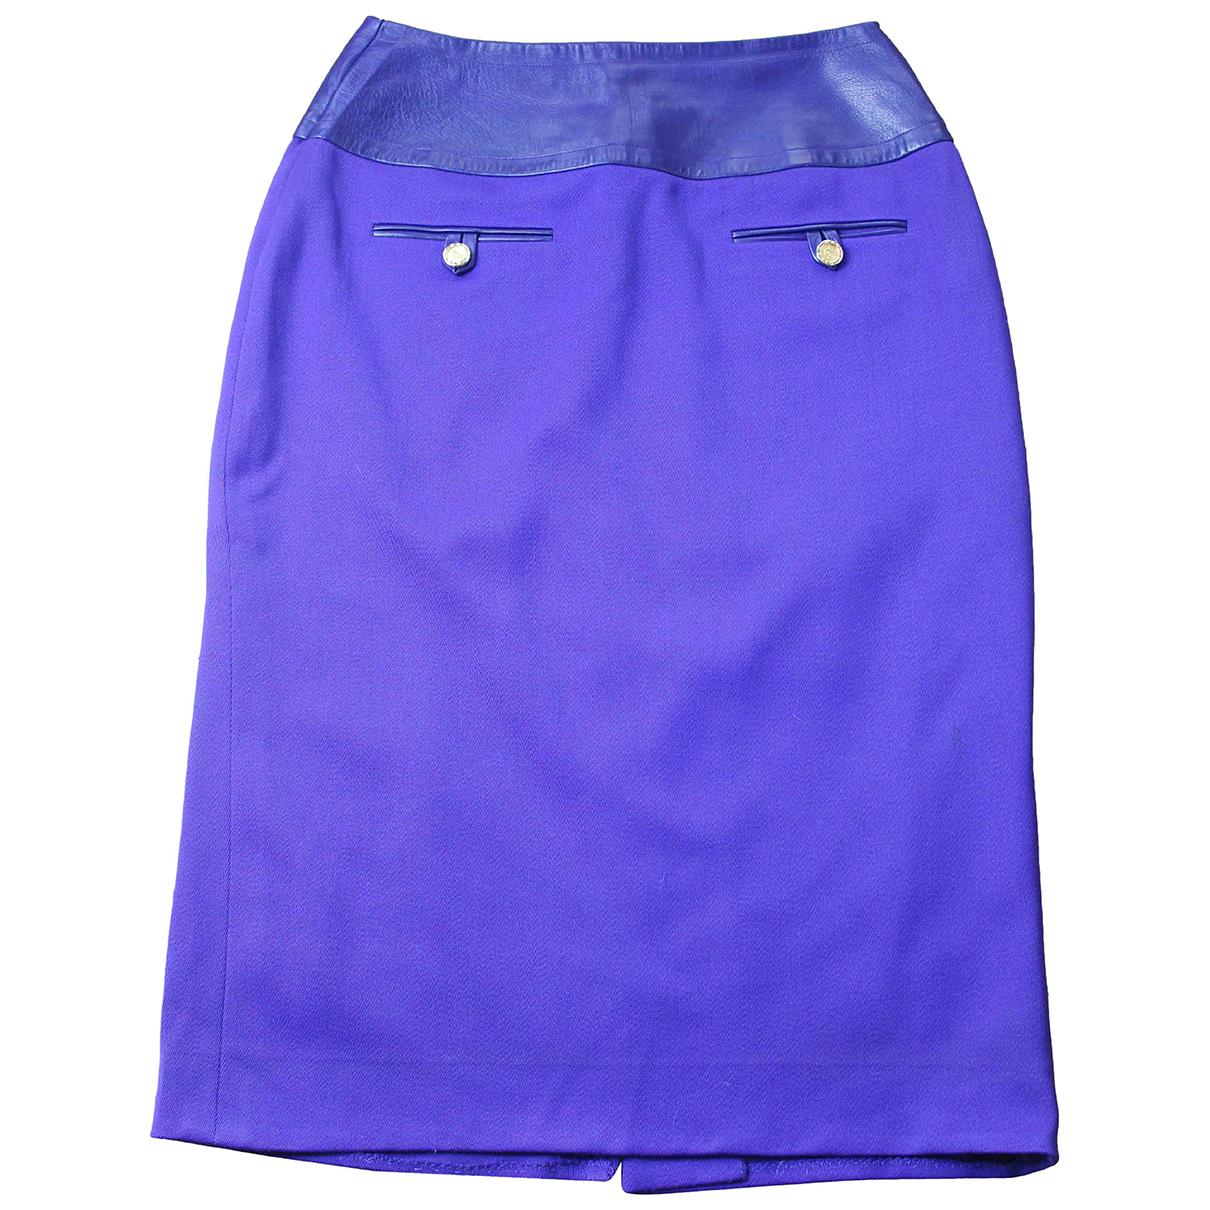 Celine - Jupe   pour femme en laine - violet